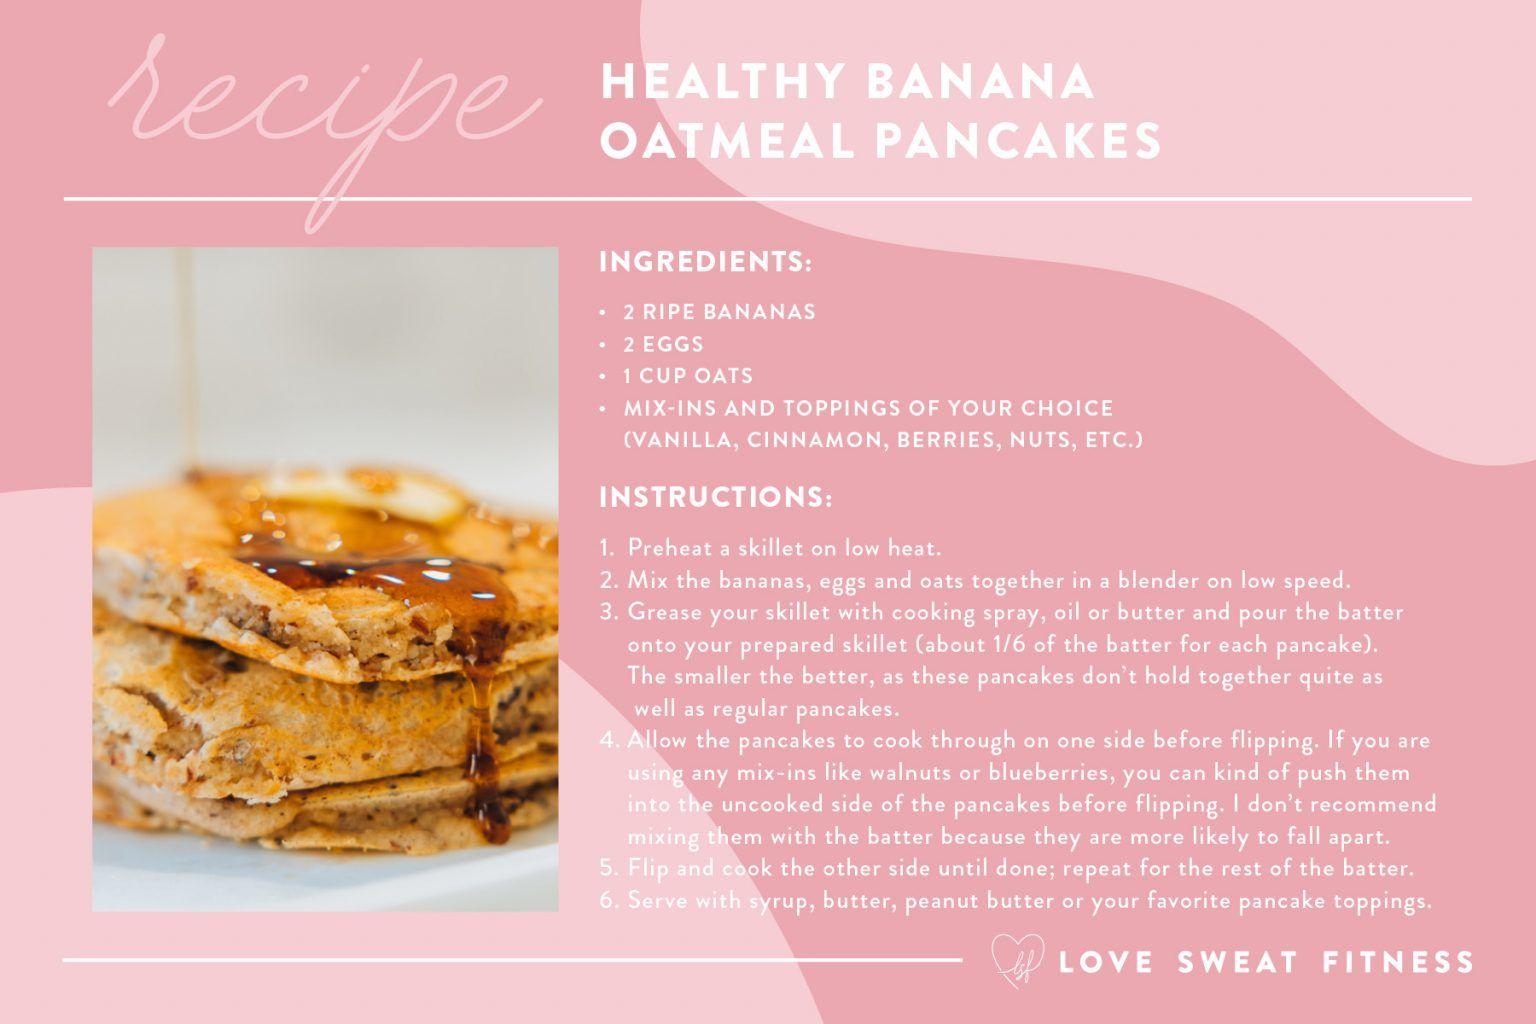 Love Sweat Fitness In 2021 Banana Healthy Healthy Pancake Recipes Banana Pancakes Healthy